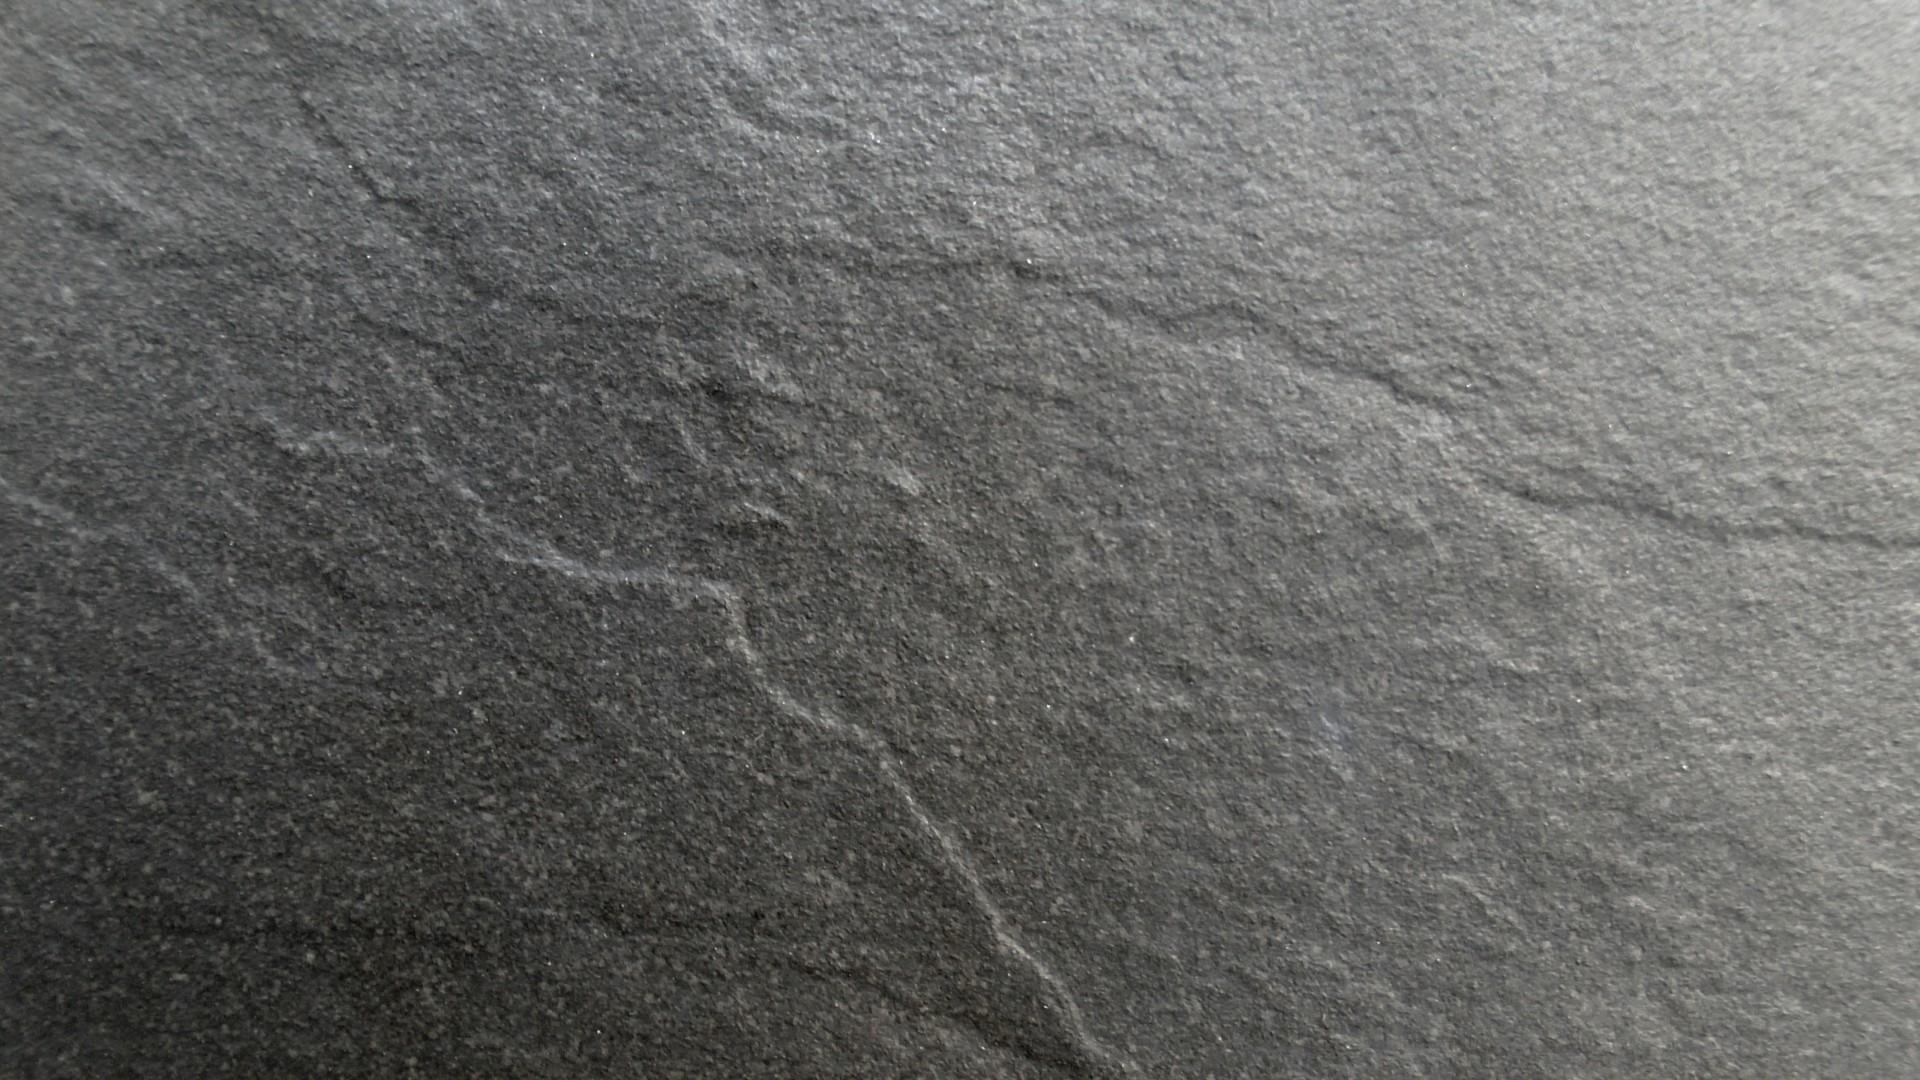 gray-slate-background